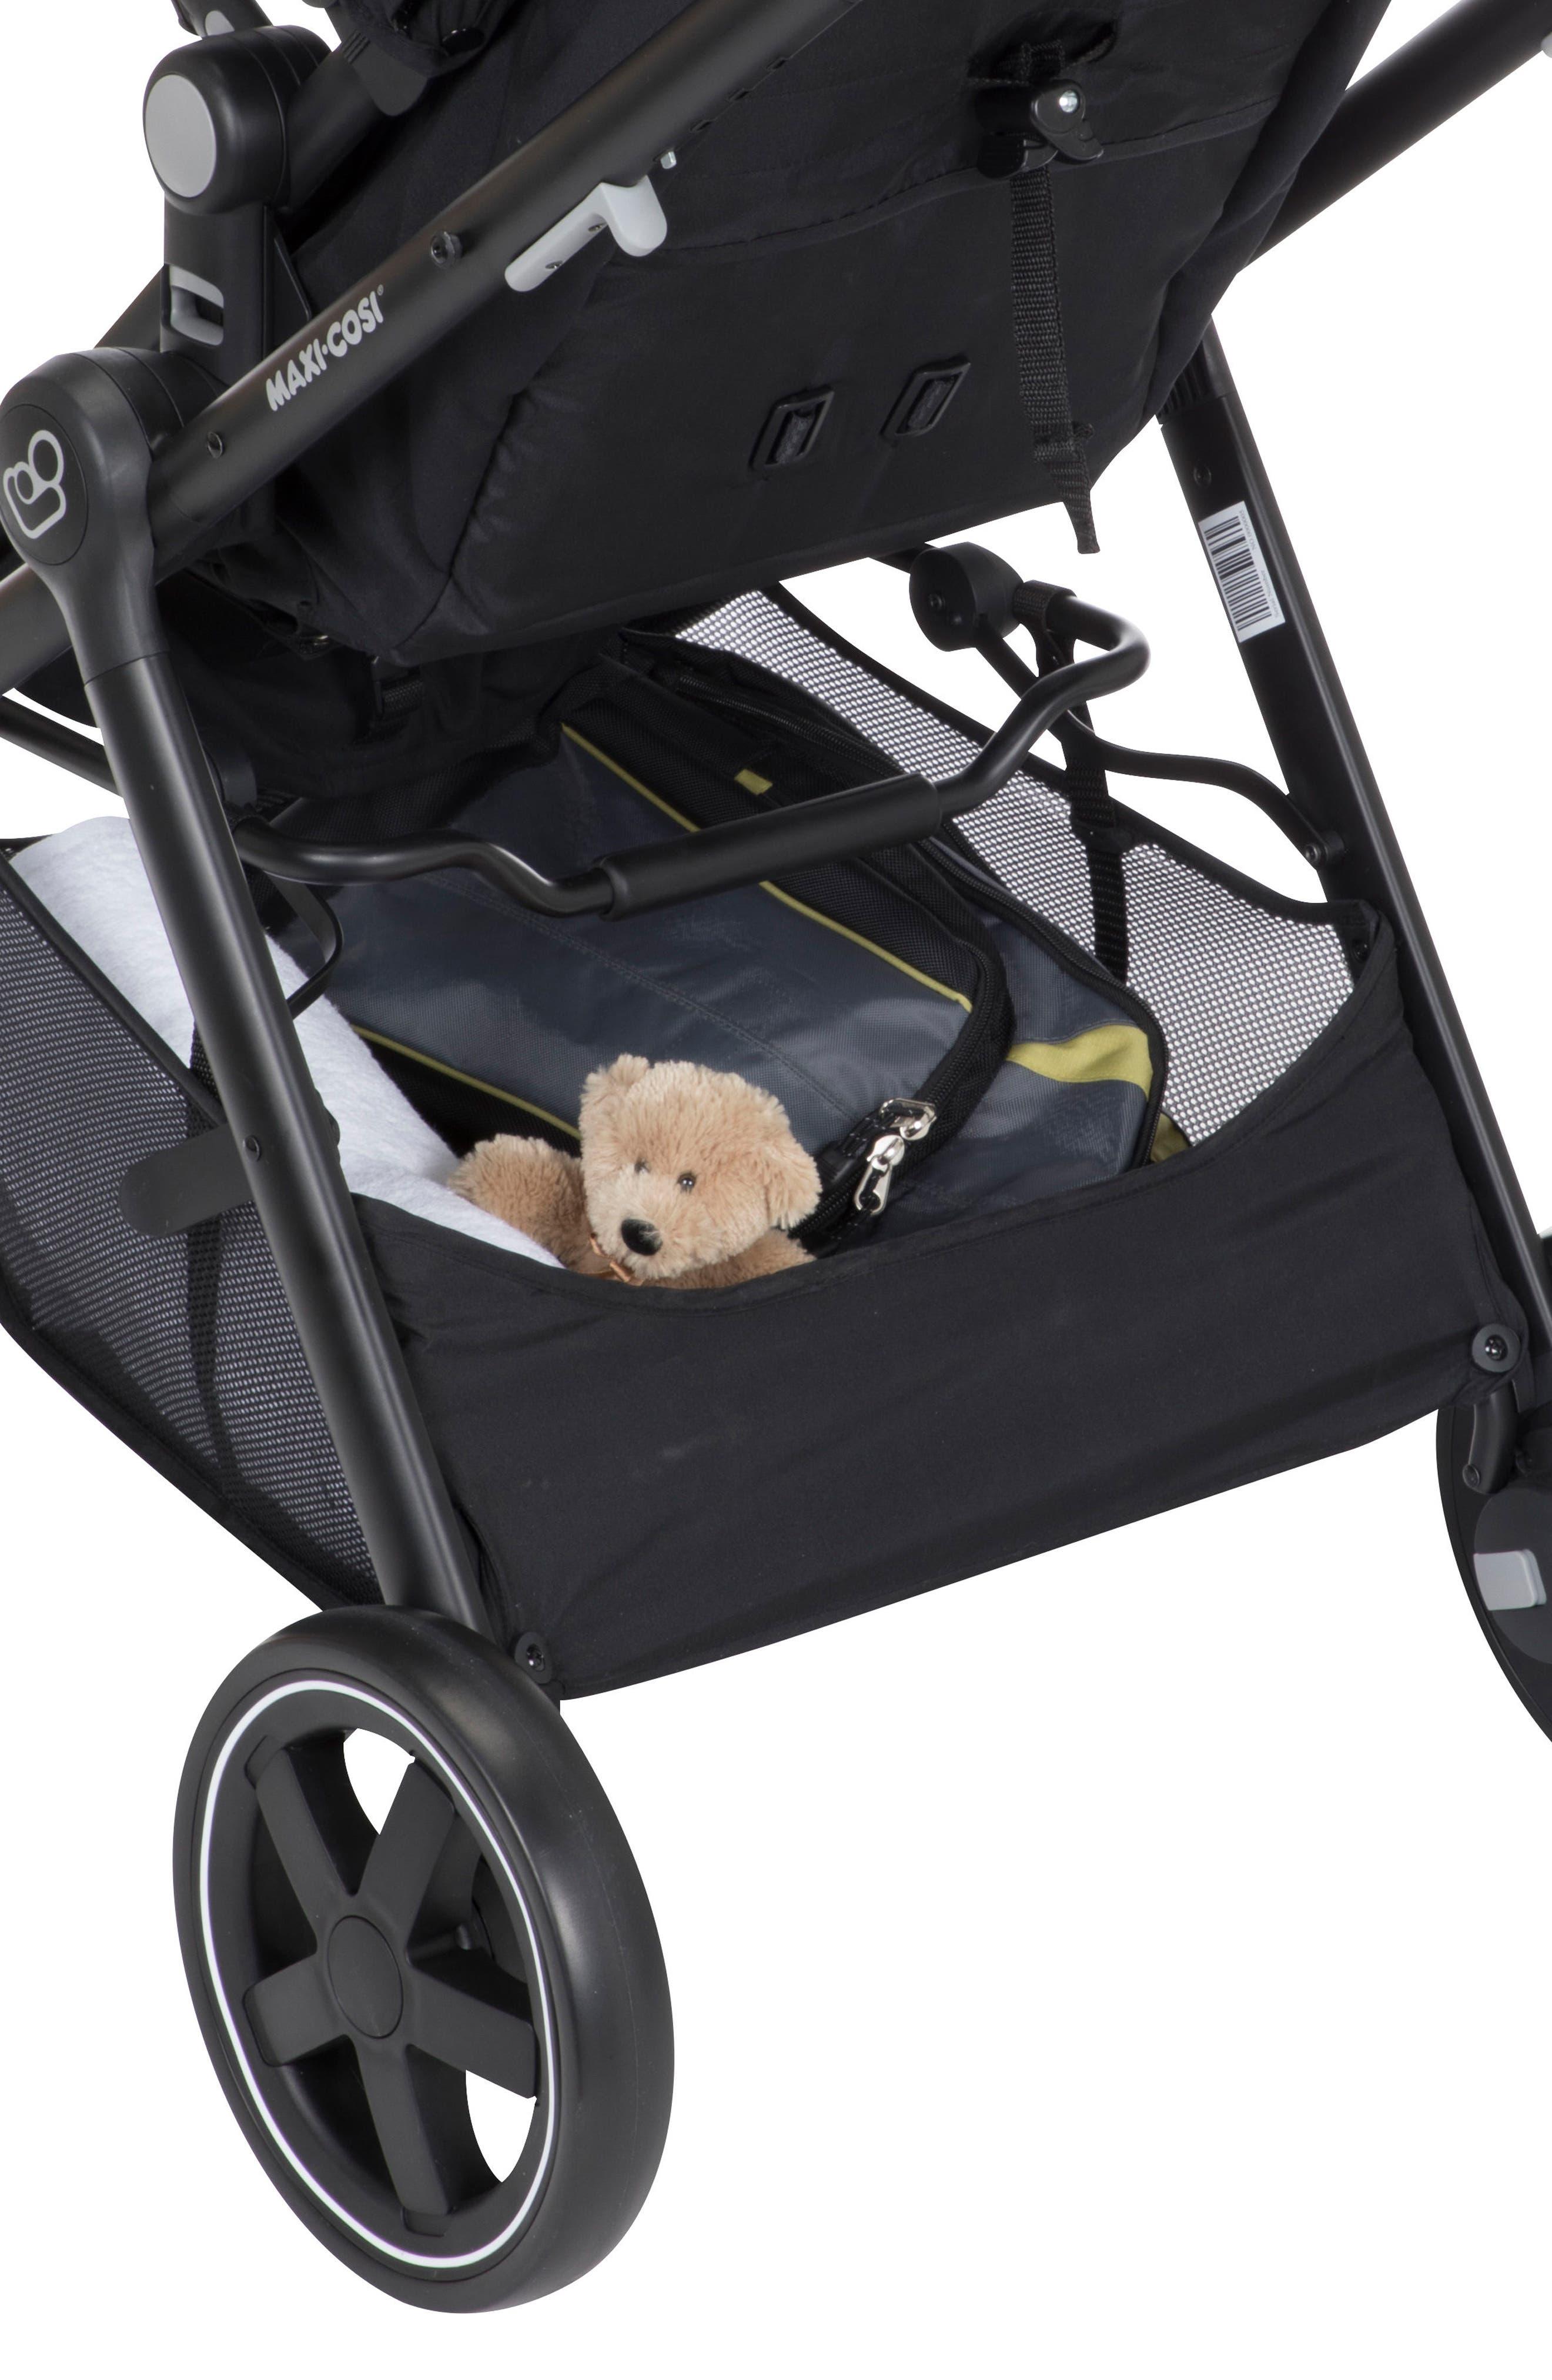 5-1 Mico 30 Infant Car Seat & Zelia Stroller Modular Travel System,                             Alternate thumbnail 6, color,                             NIGHT BLACK